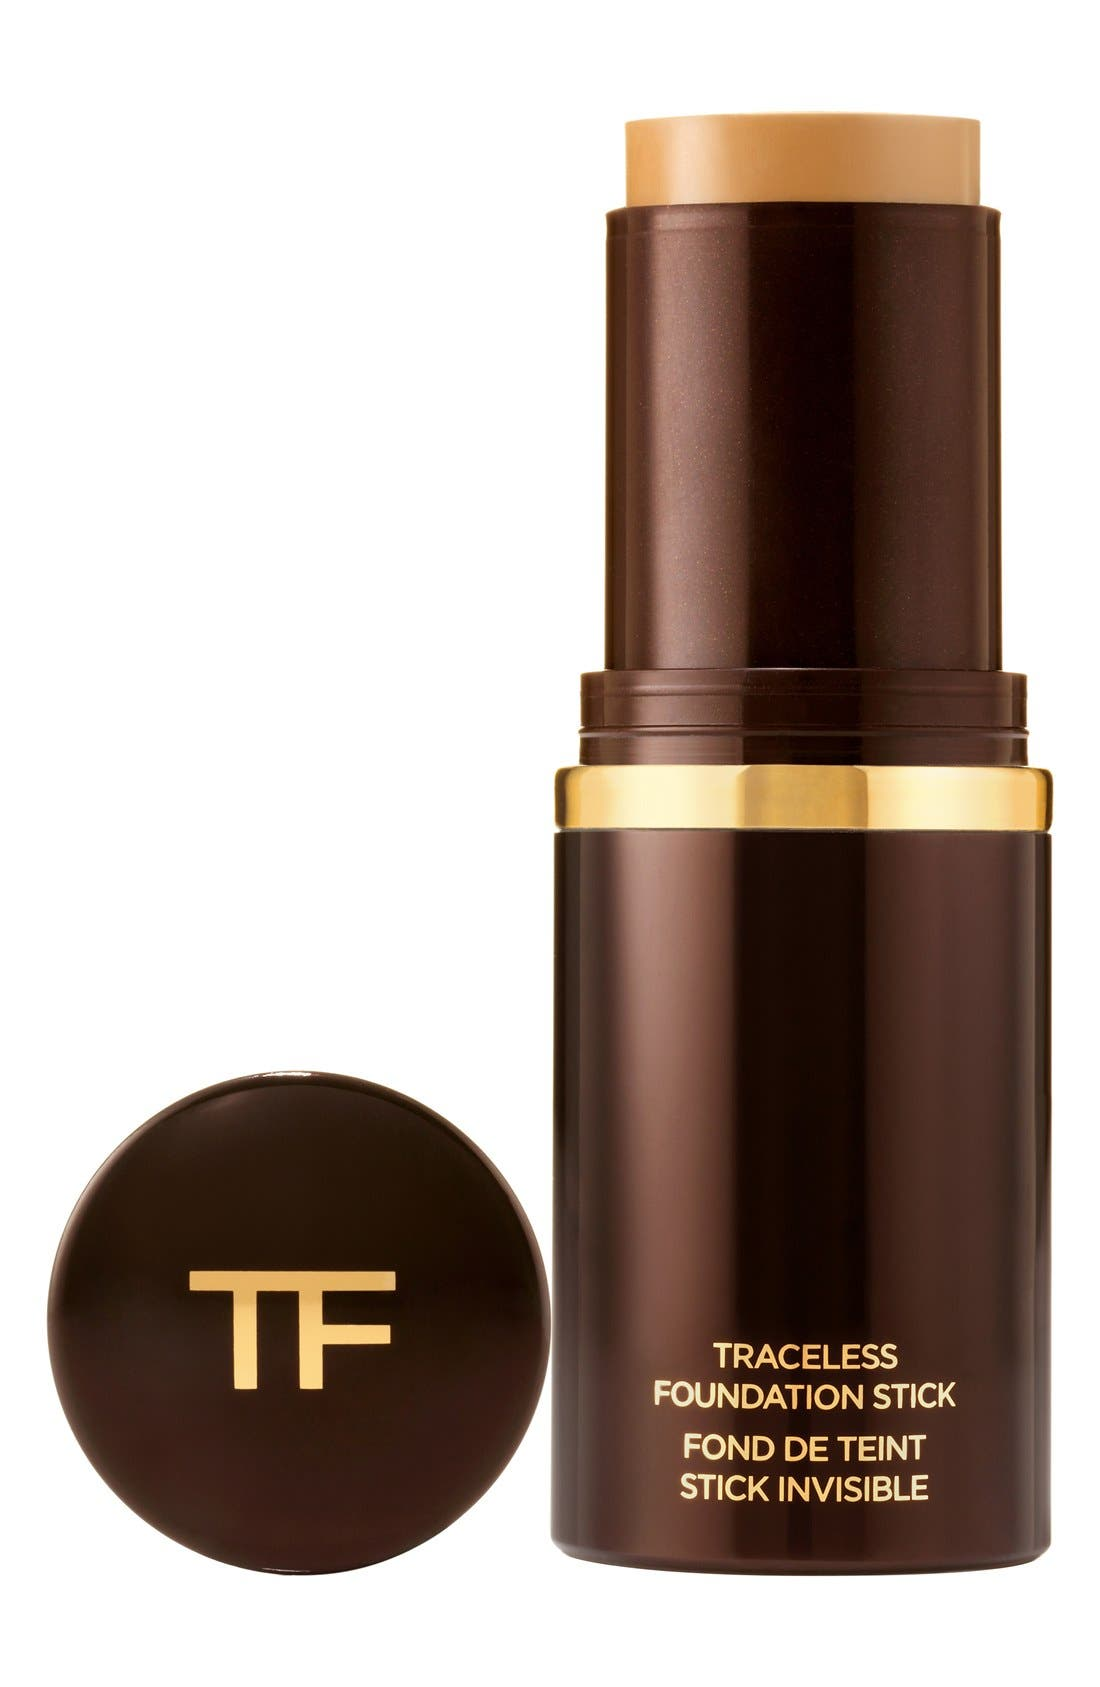 Traceless Foundation Stick,                             Main thumbnail 1, color,                             7.0 TAWNY